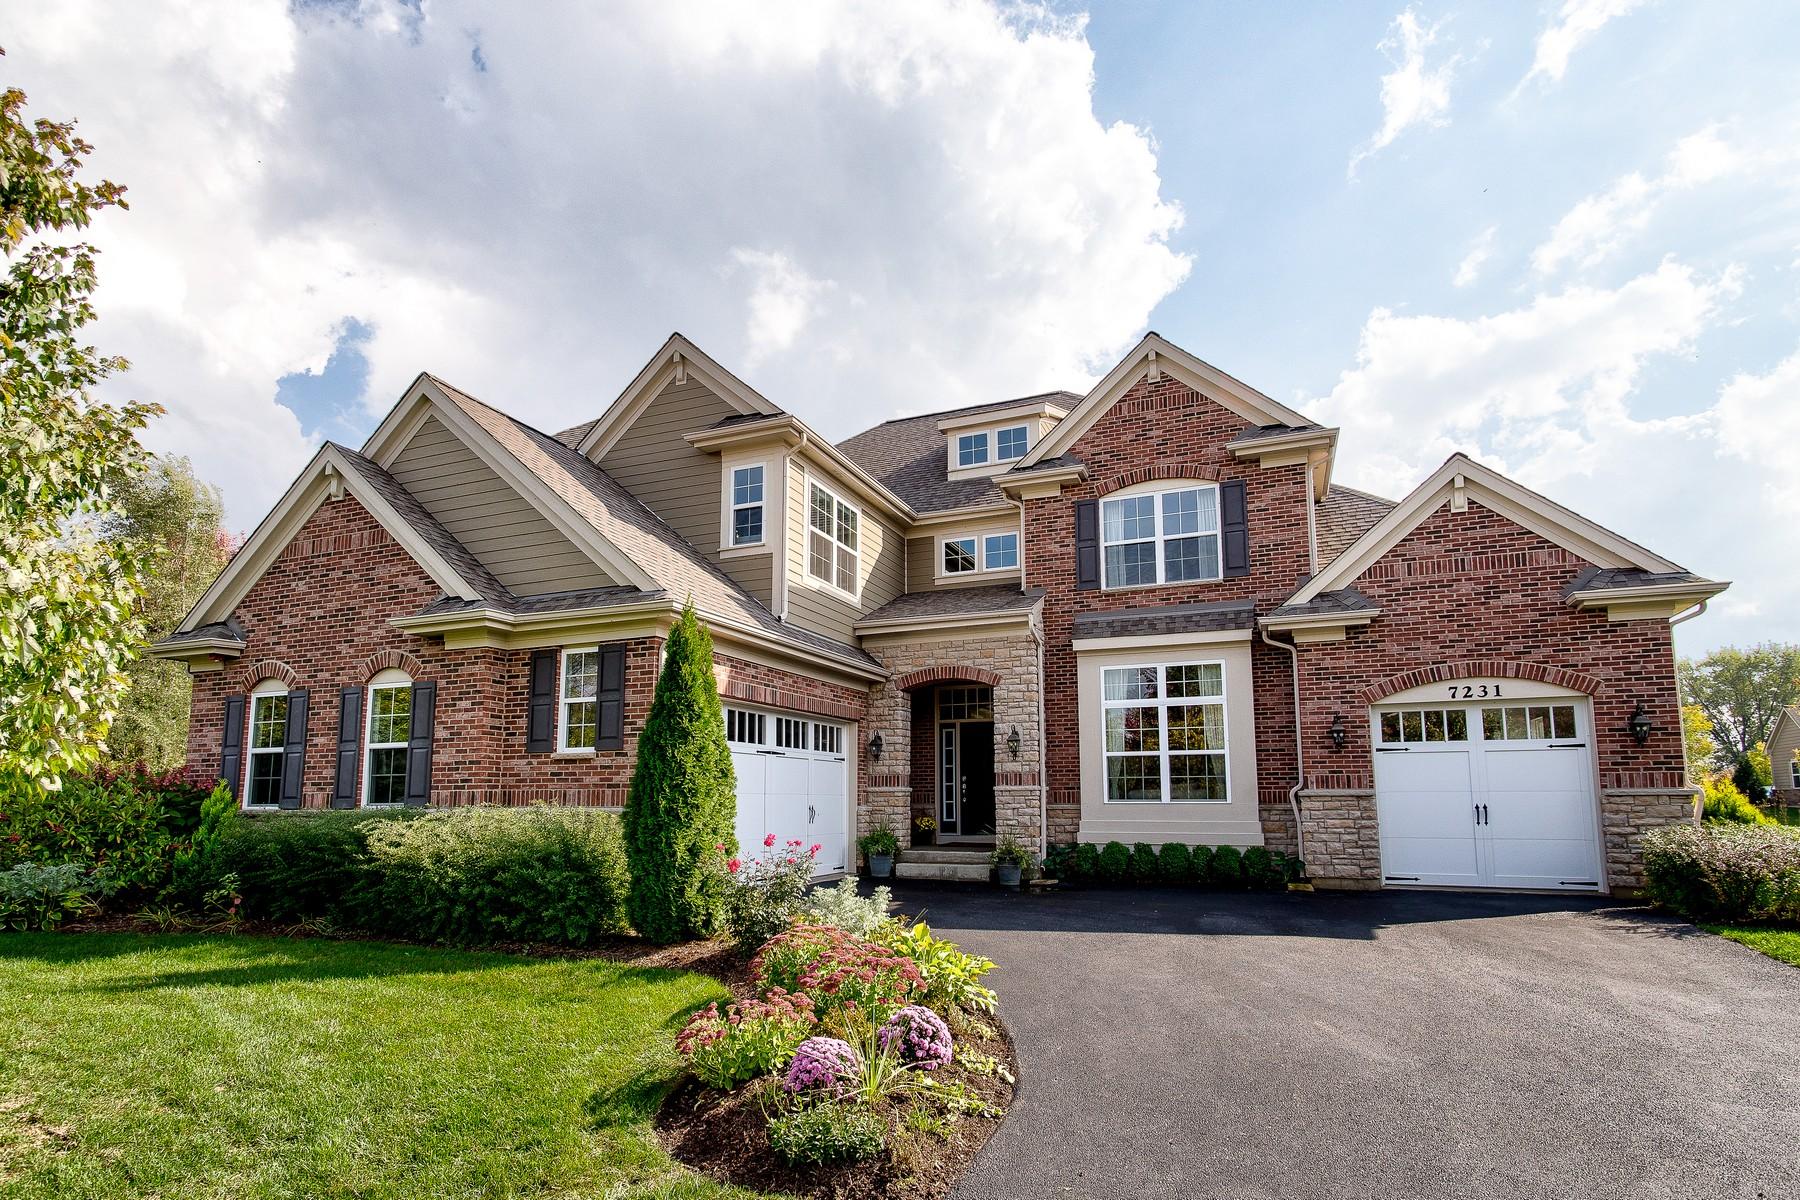 Single Family Home for Sale at Ravenna Subdivision 7231 Roxbury Court Long Grove, Illinois 60060 United States